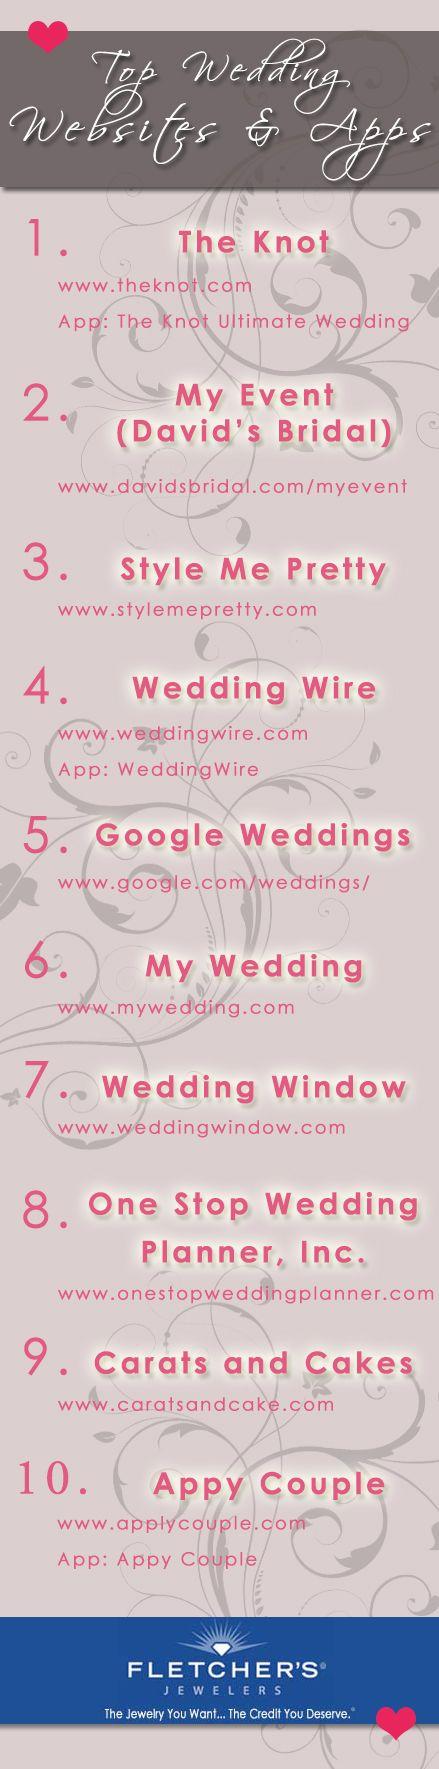 Top Wedding Planning Websites & Apps of 2013! | Revolutionizing the 21st century wedding planning process!